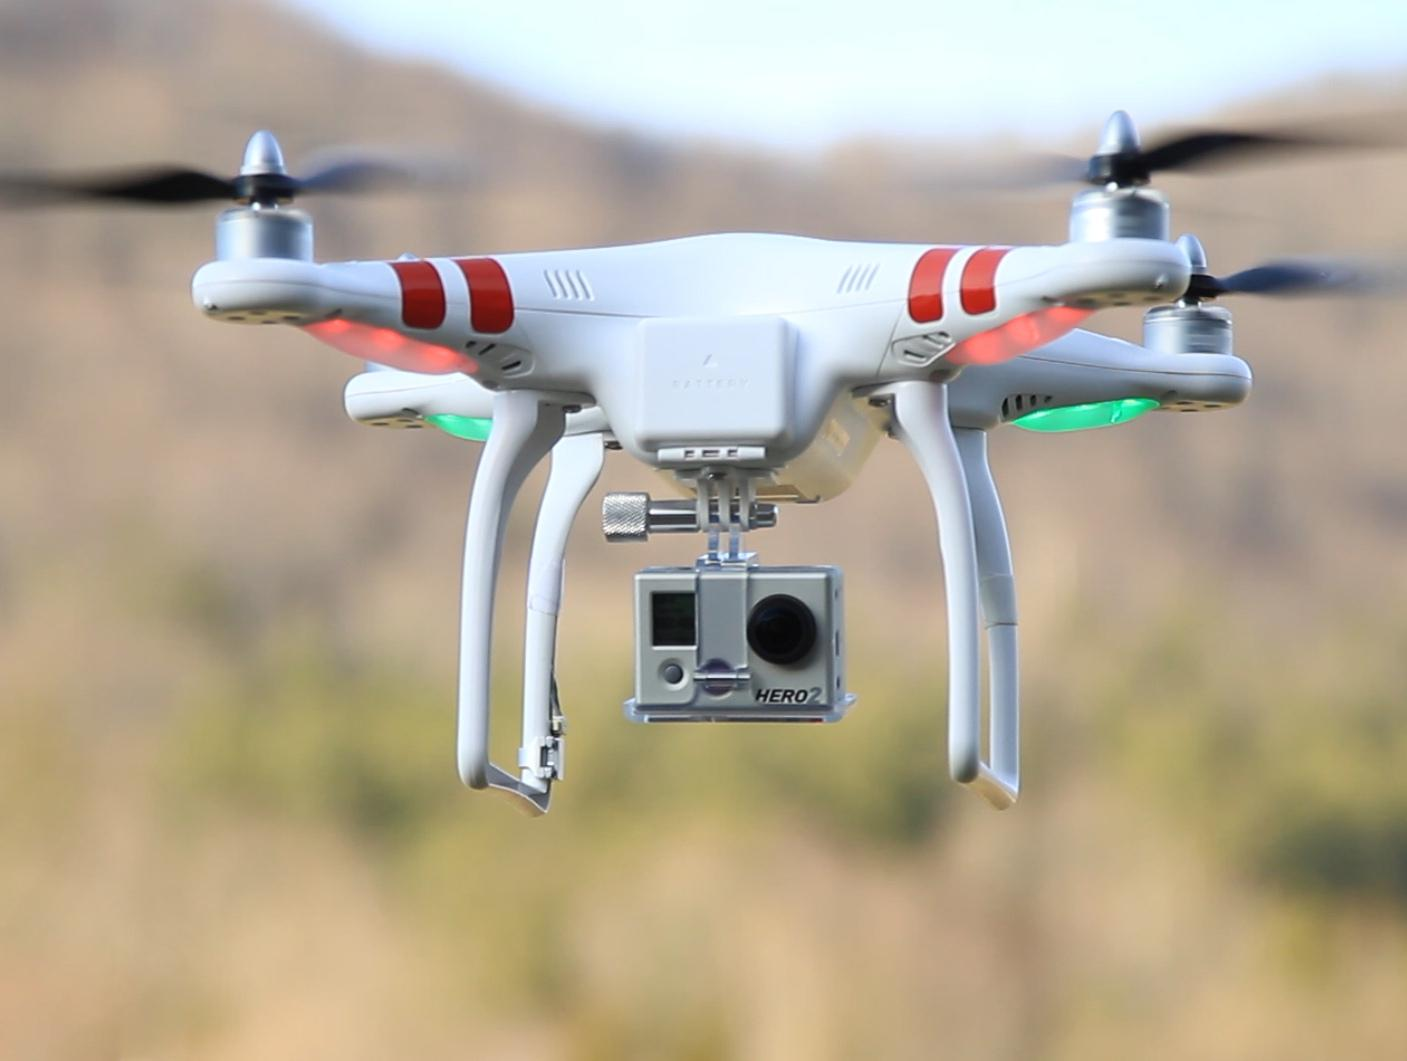 Квадрокоптер пересек границу рф купить dji phantom vision